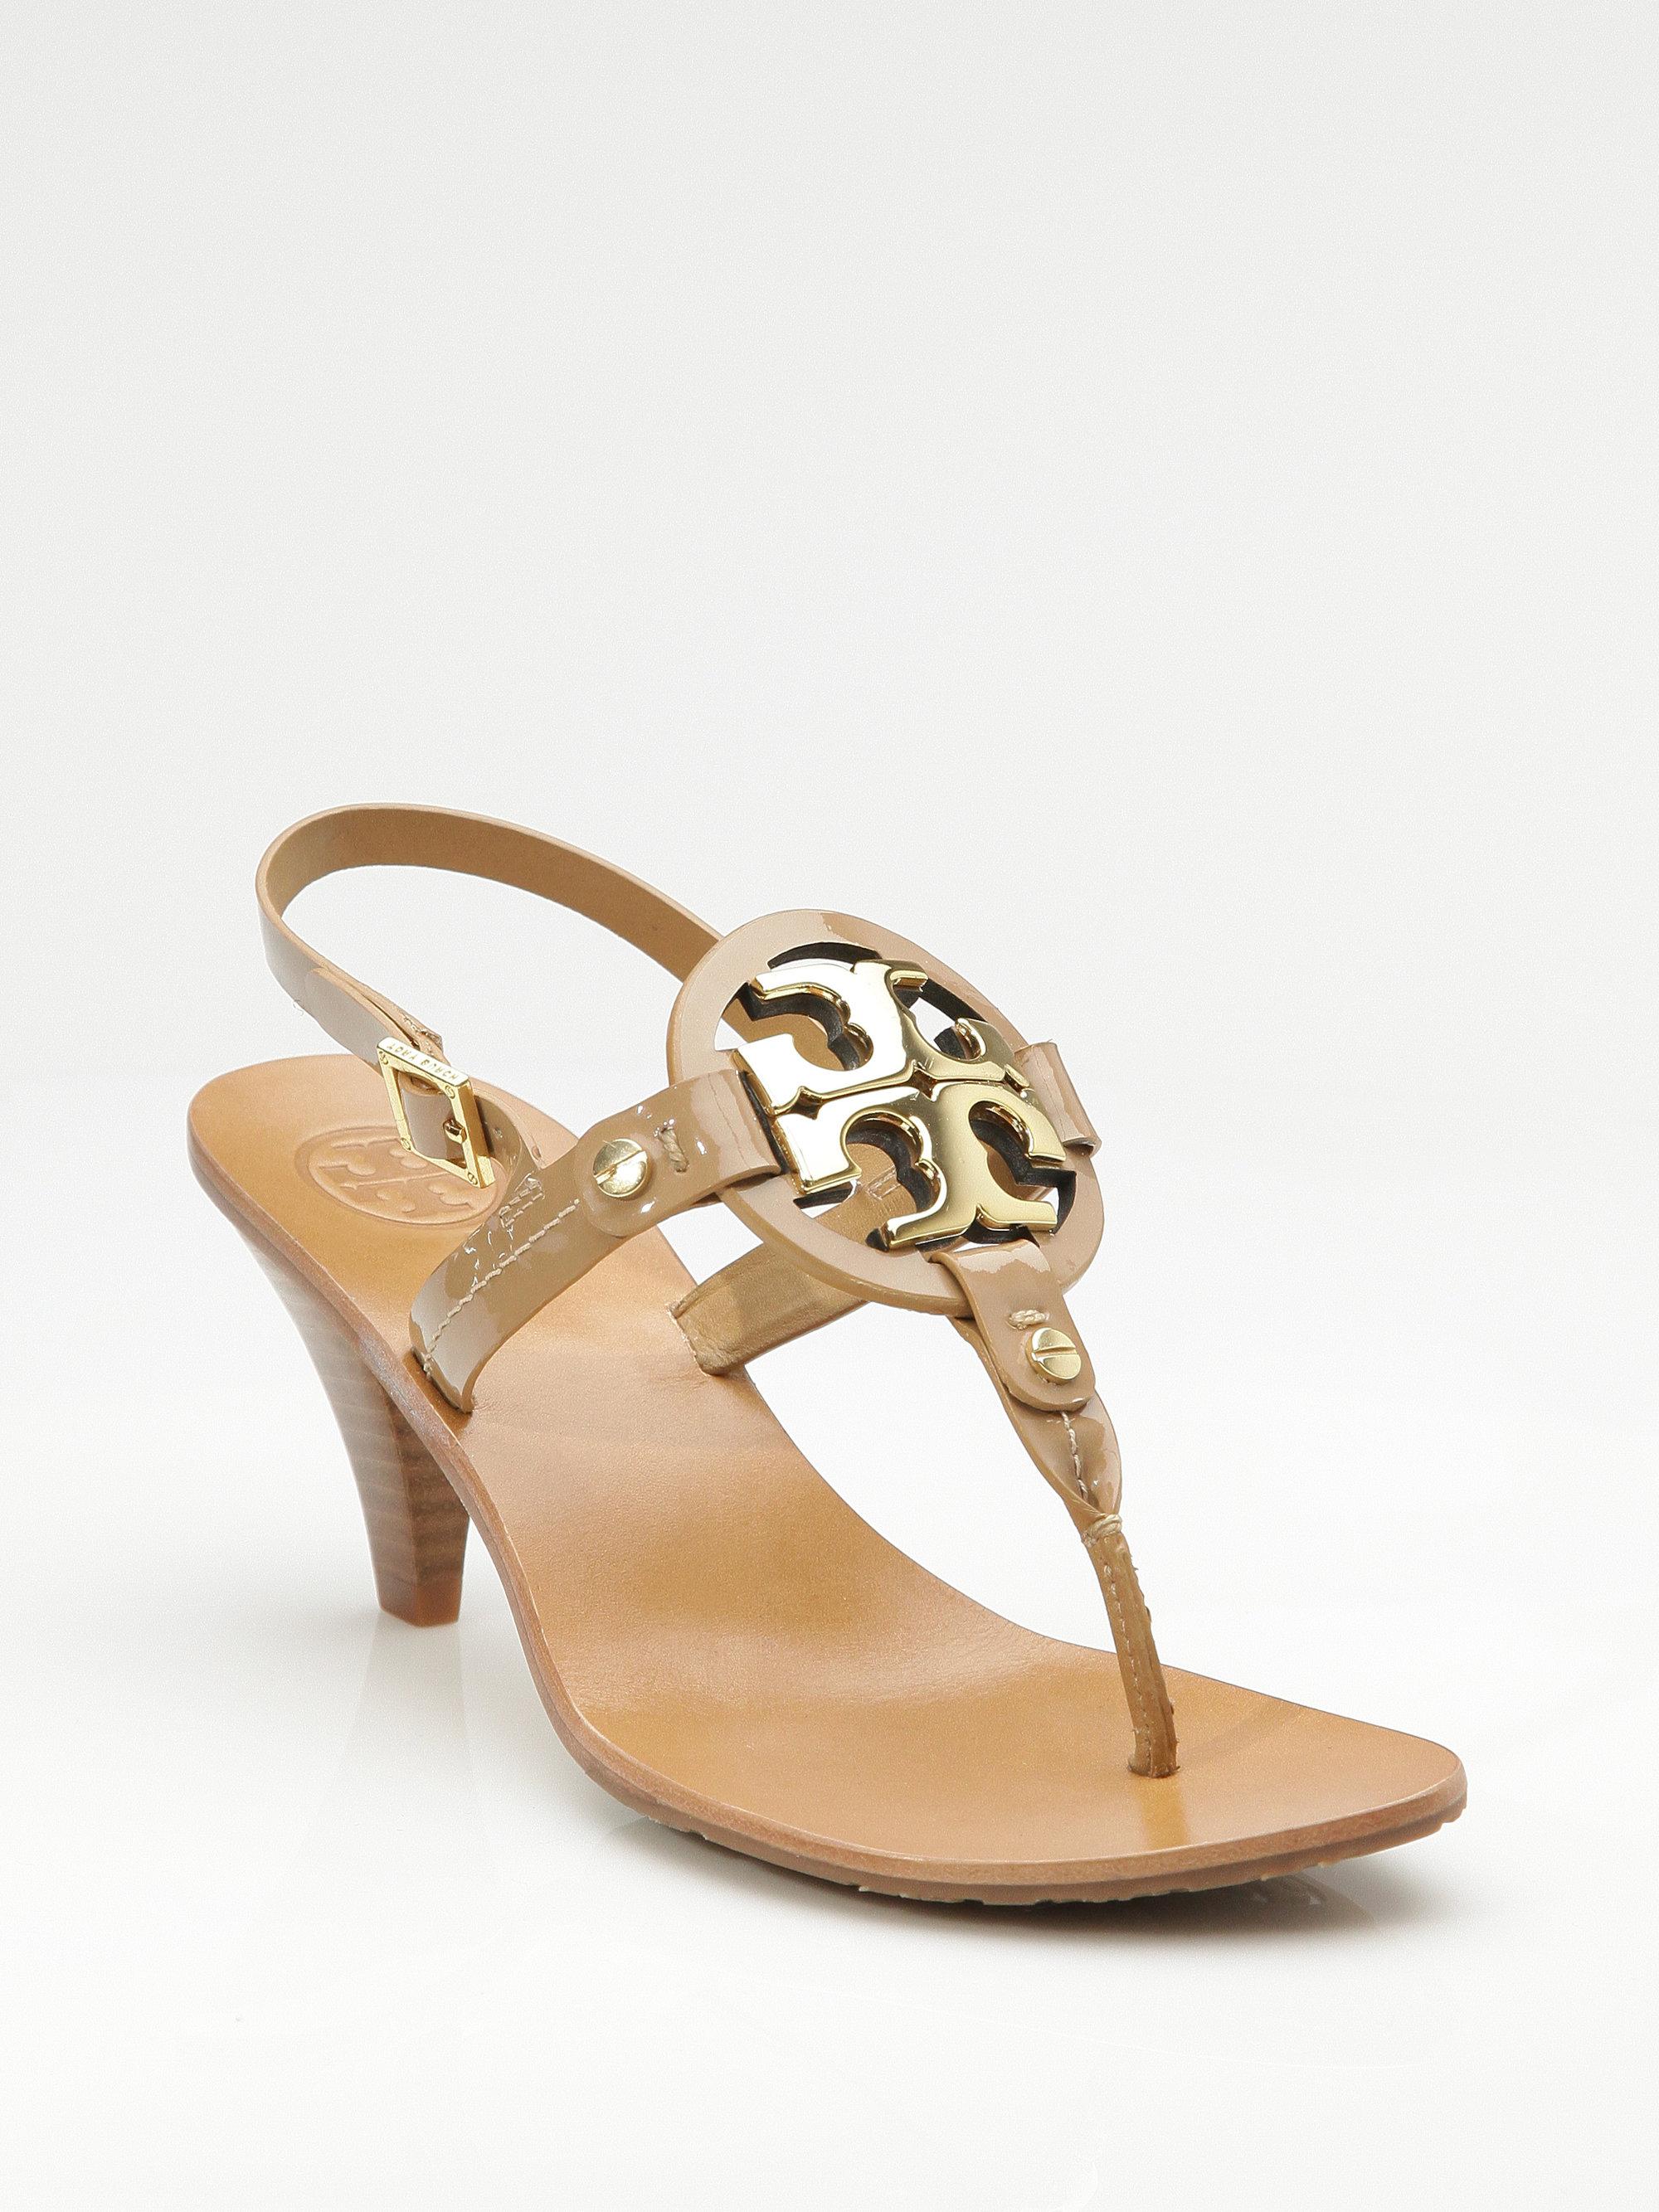 Tory Burch Holly 2 Kitten Heel Logo Patent Thong Sandals